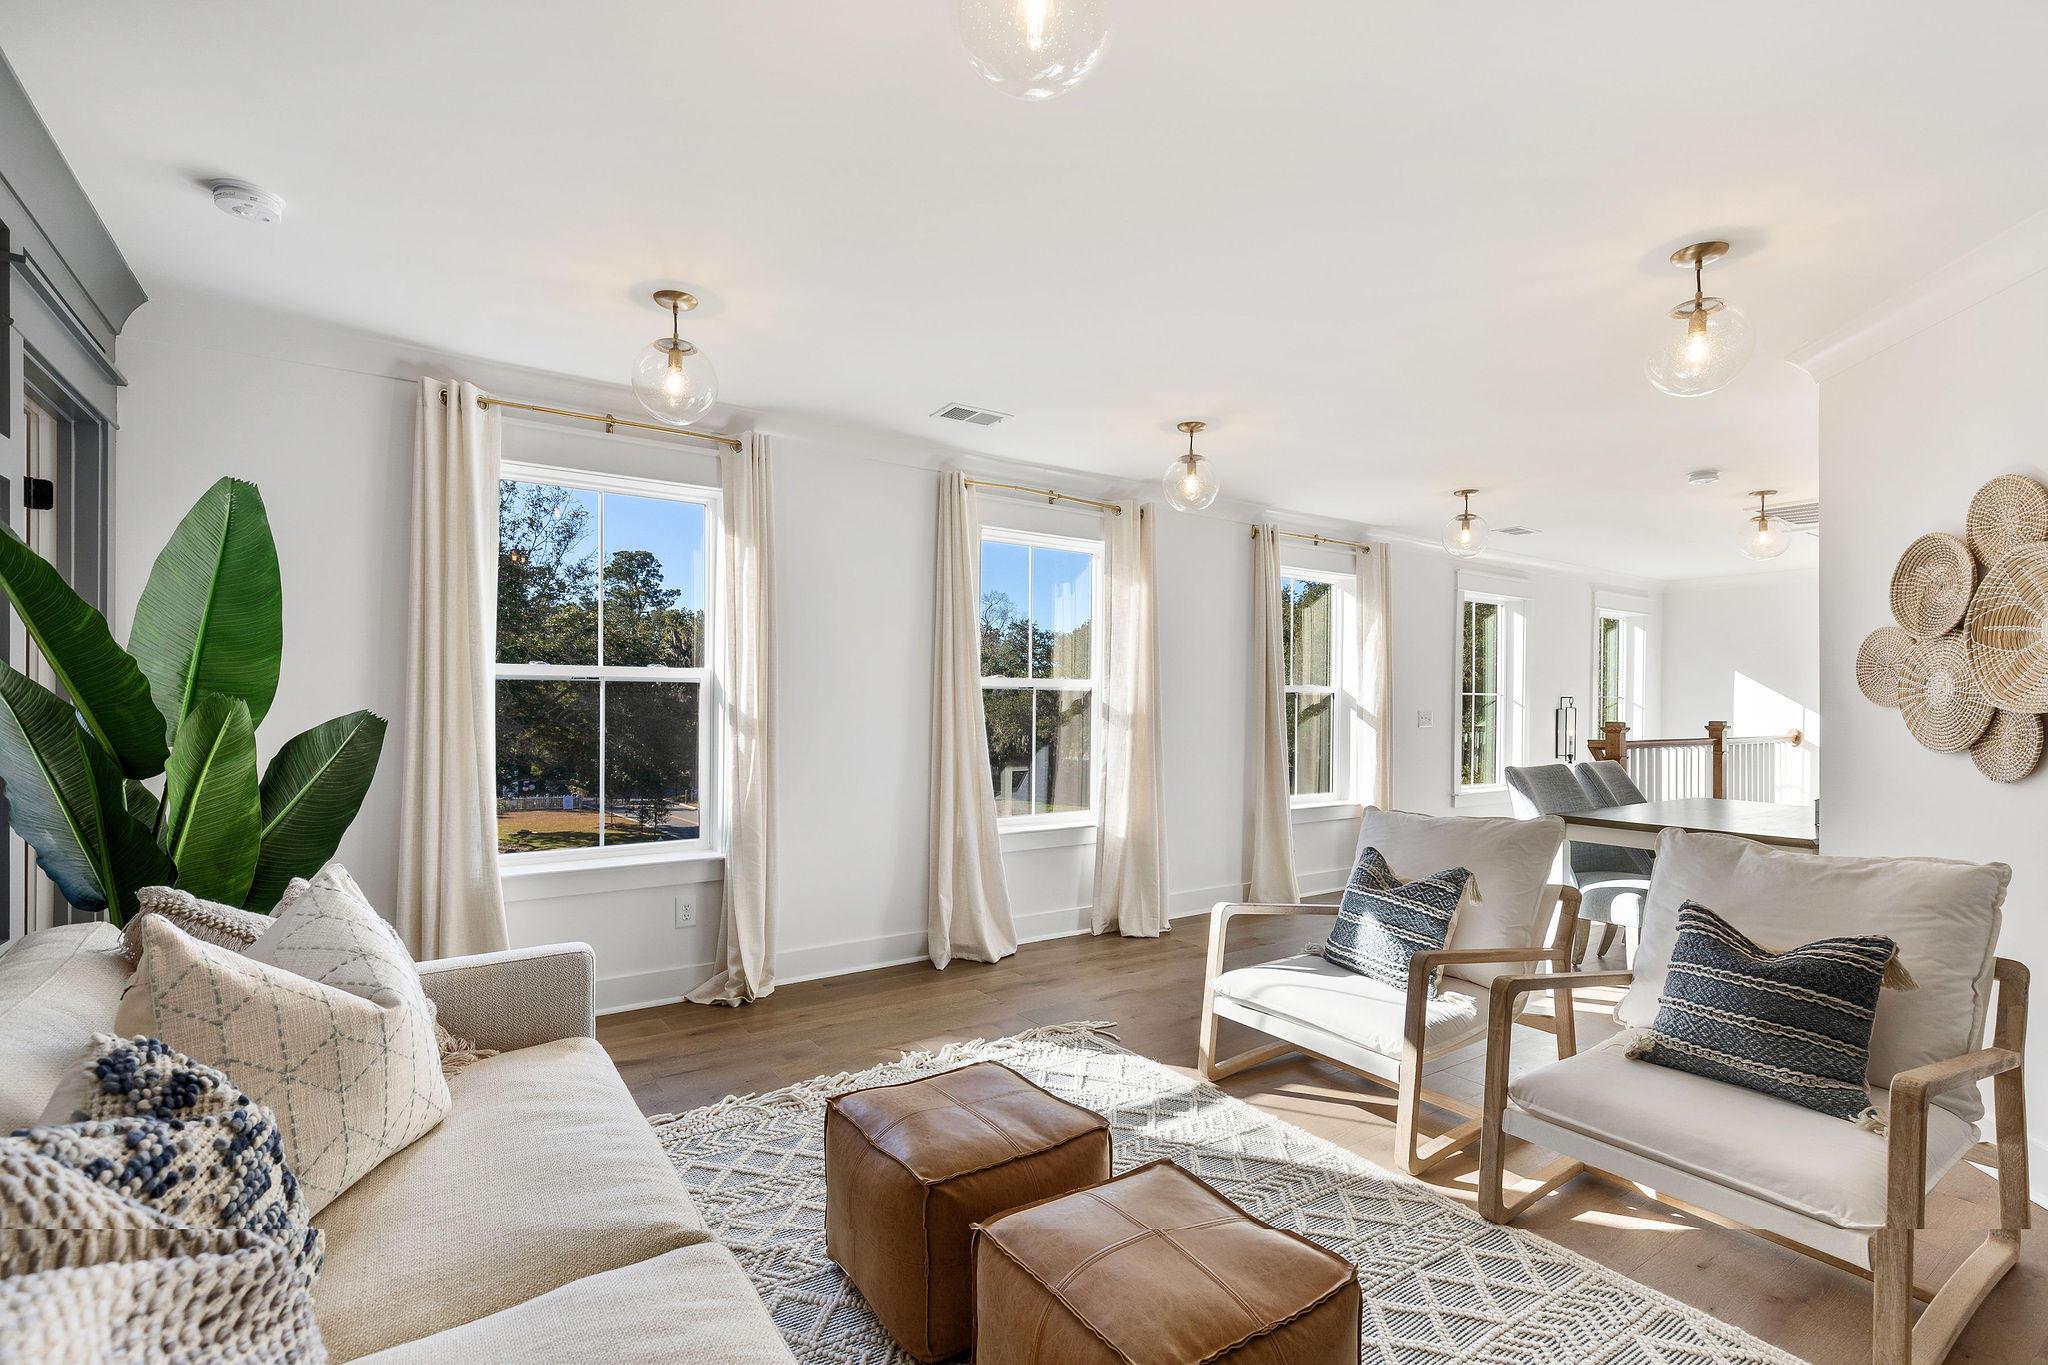 Avenue of Oaks Homes For Sale - 1027 Avenue Of Oaks, Charleston, SC - 18